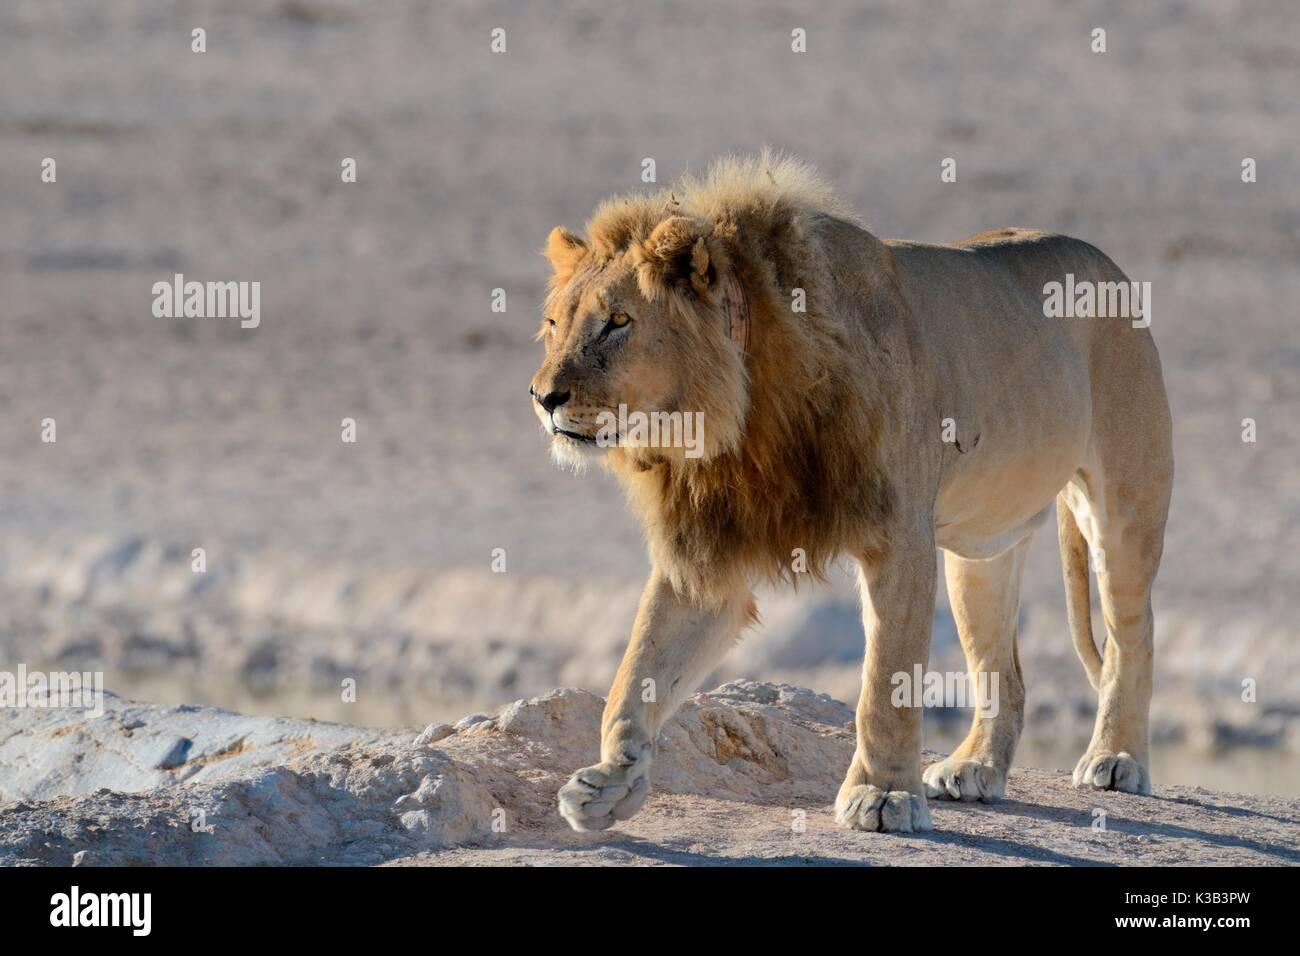 Afrikanischer Löwe (Panthera leo) mit Tracking collar, Wandern, Etosha Nationalpark, Namibia Stockbild